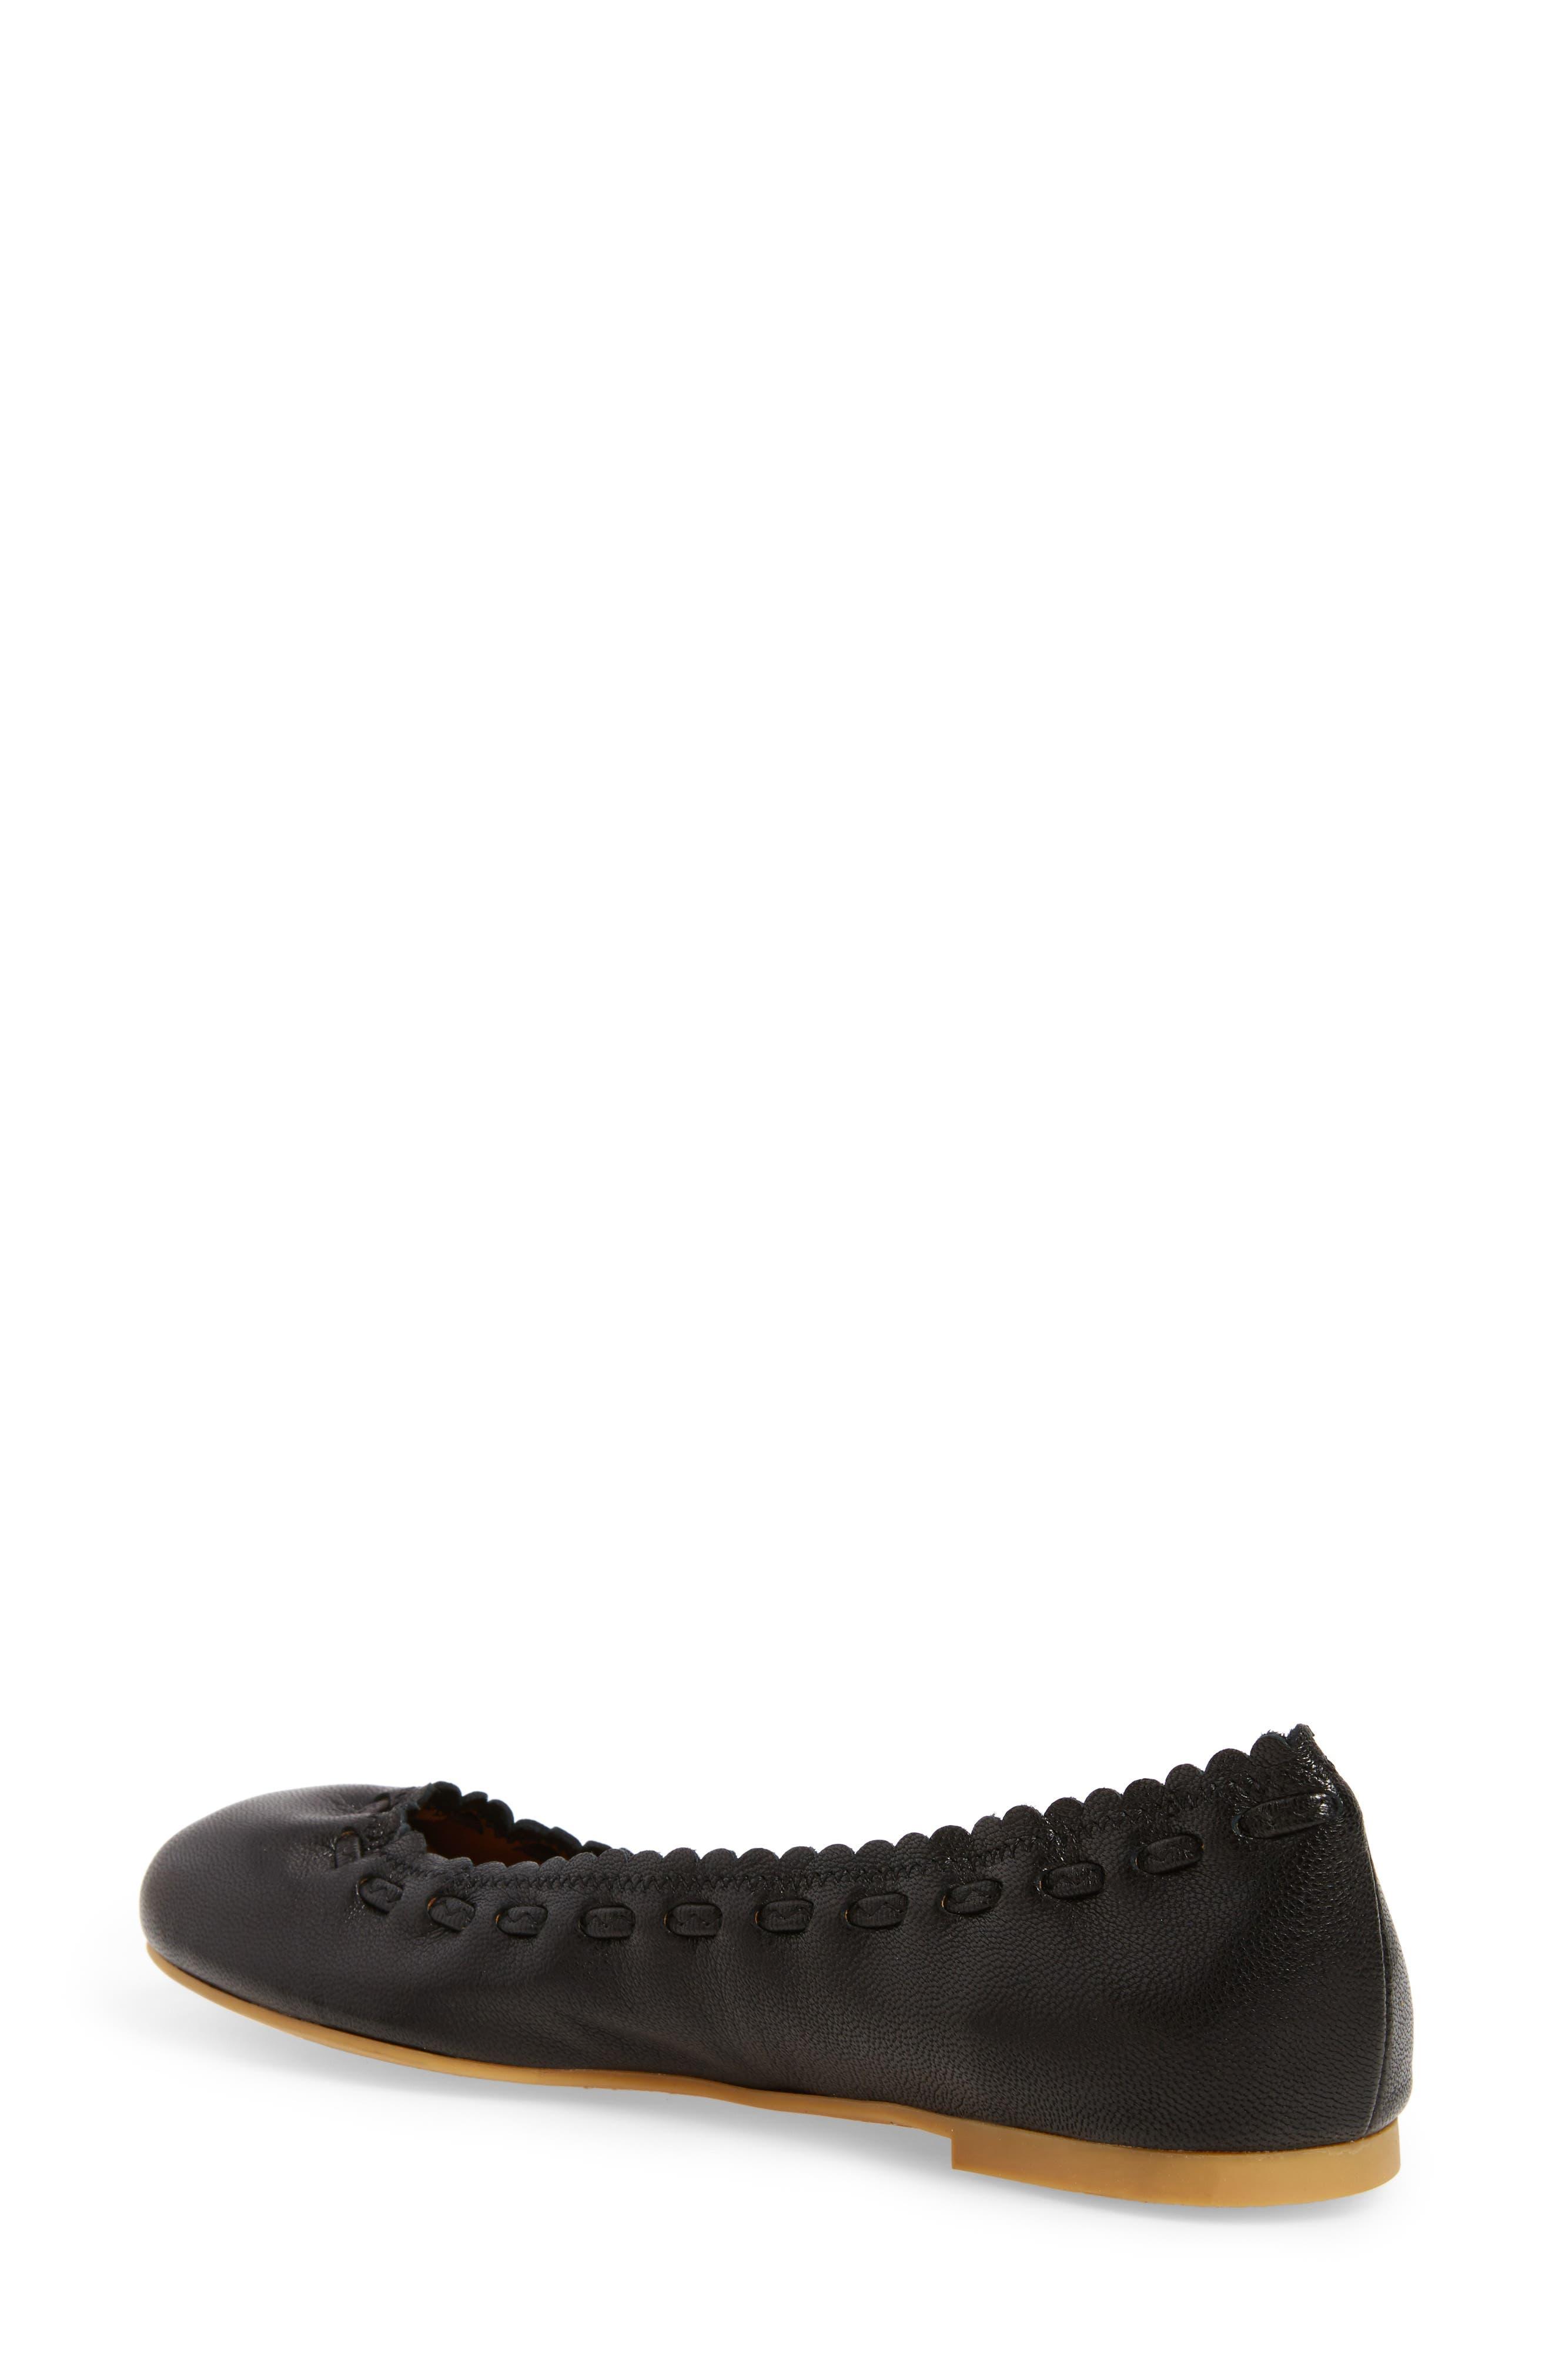 'Jane' Ballerina Flat,                             Alternate thumbnail 2, color,                             Black/ Goat Leather